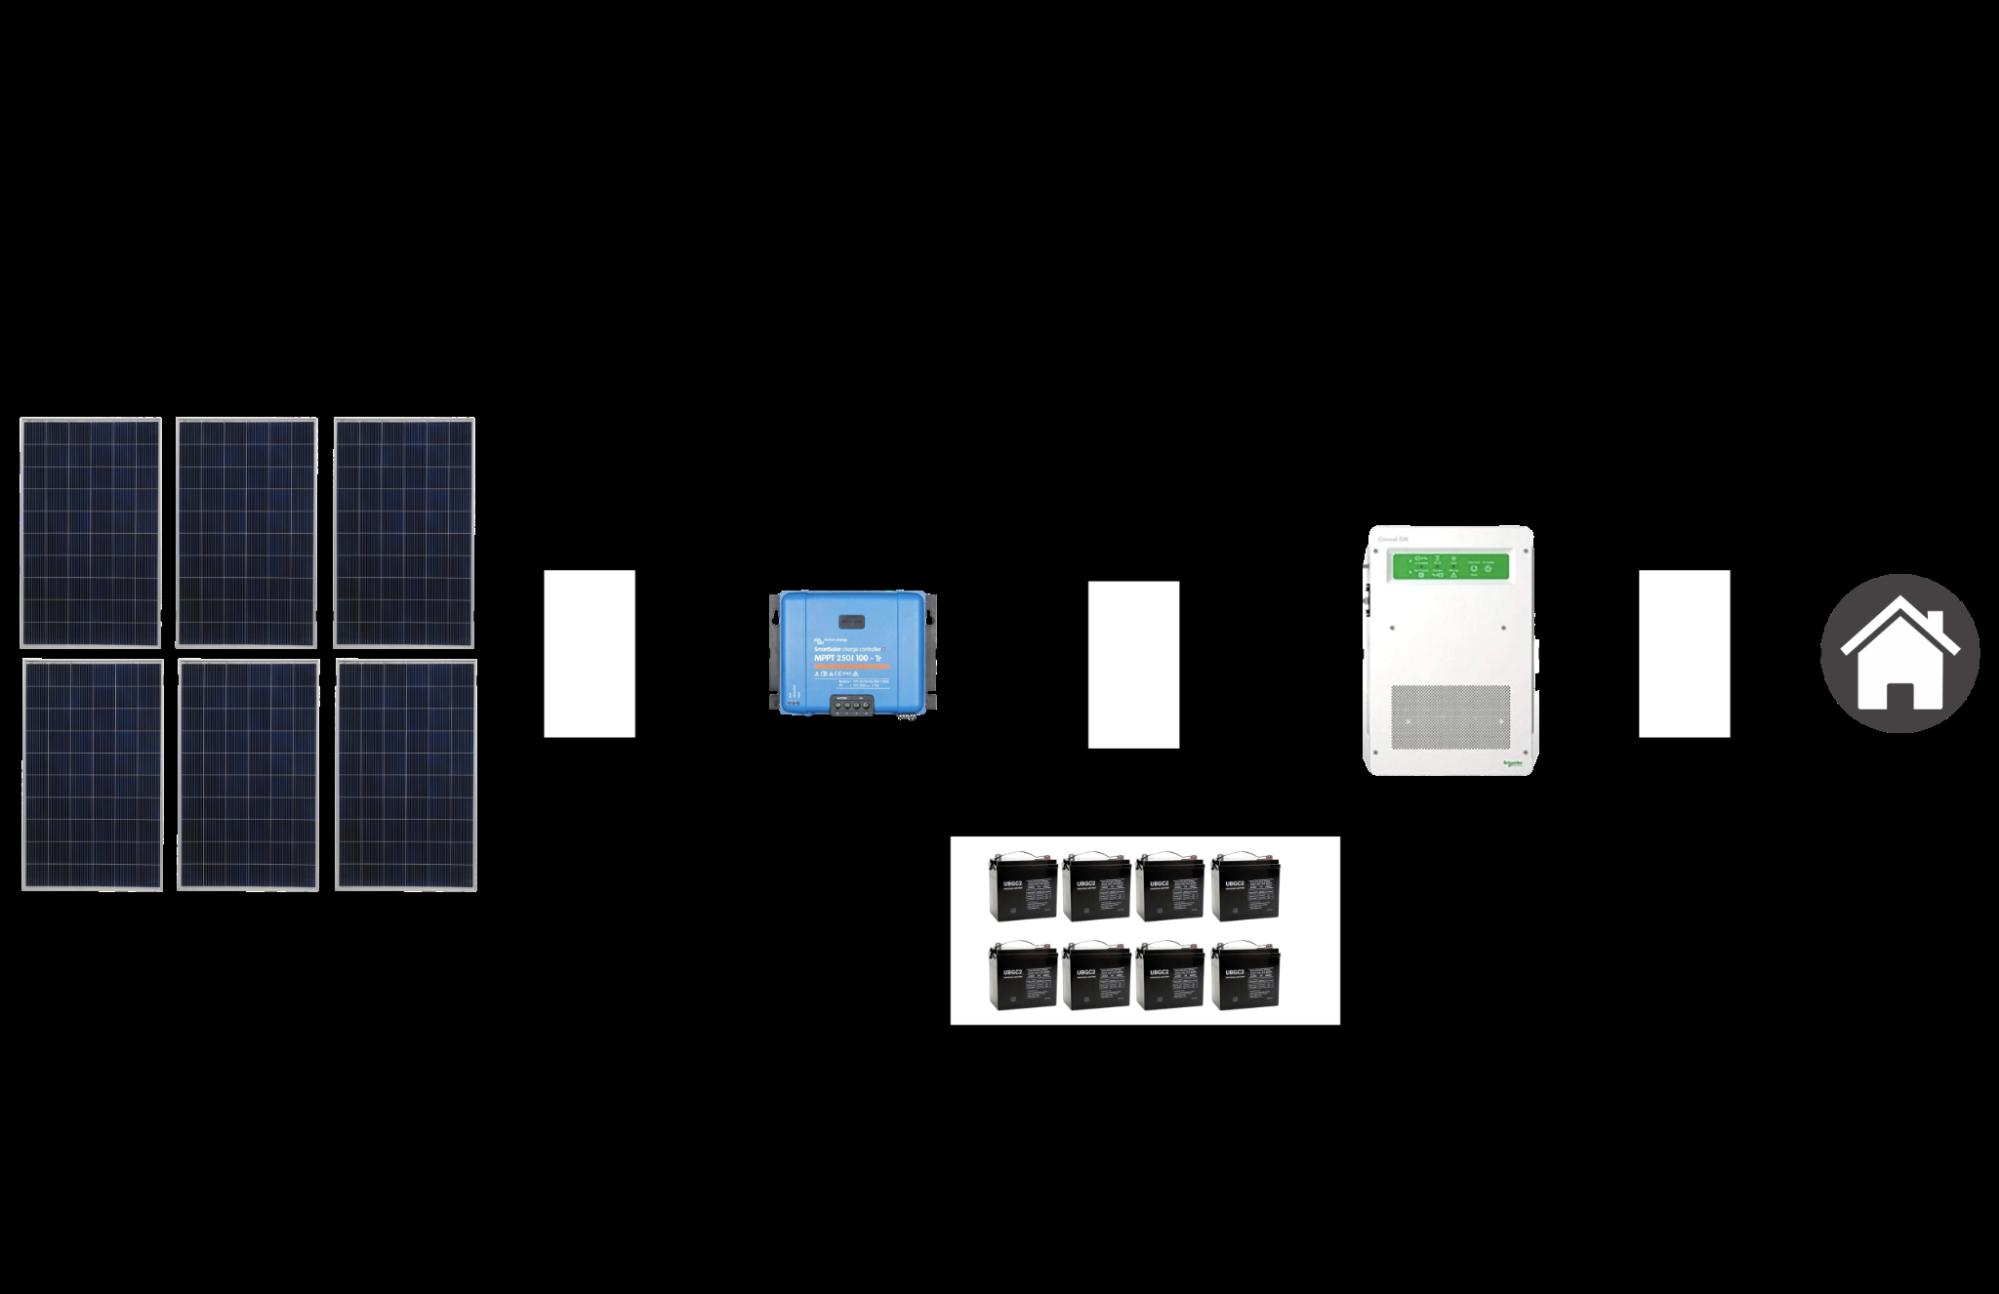 Off-grid 4.0 technical details